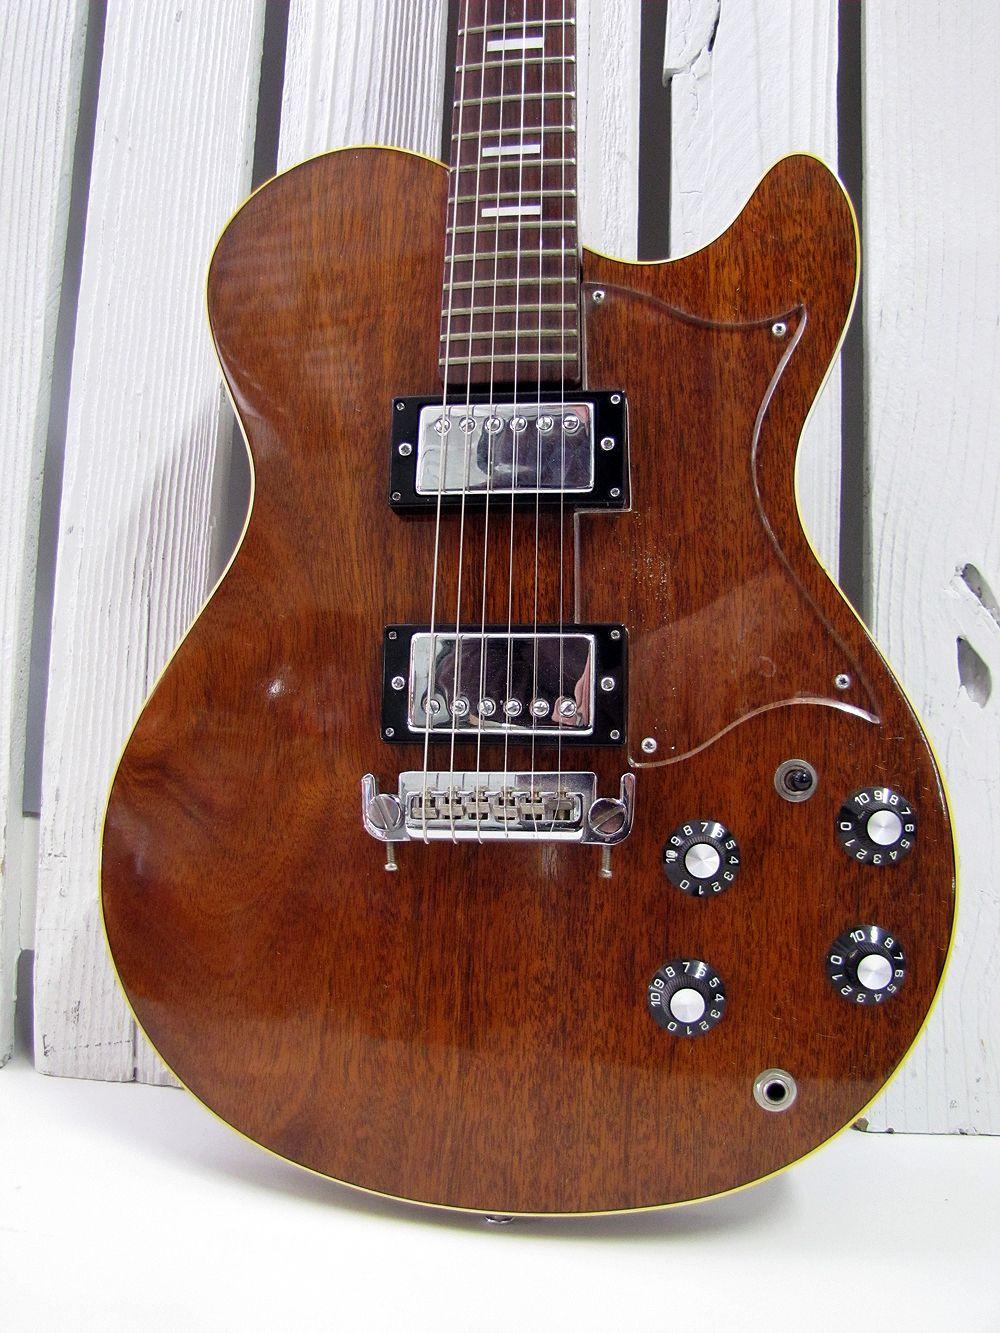 VINTAGE 1976 GRETSCH 7635 ROC II ROCK ELECTRIC GUITAR